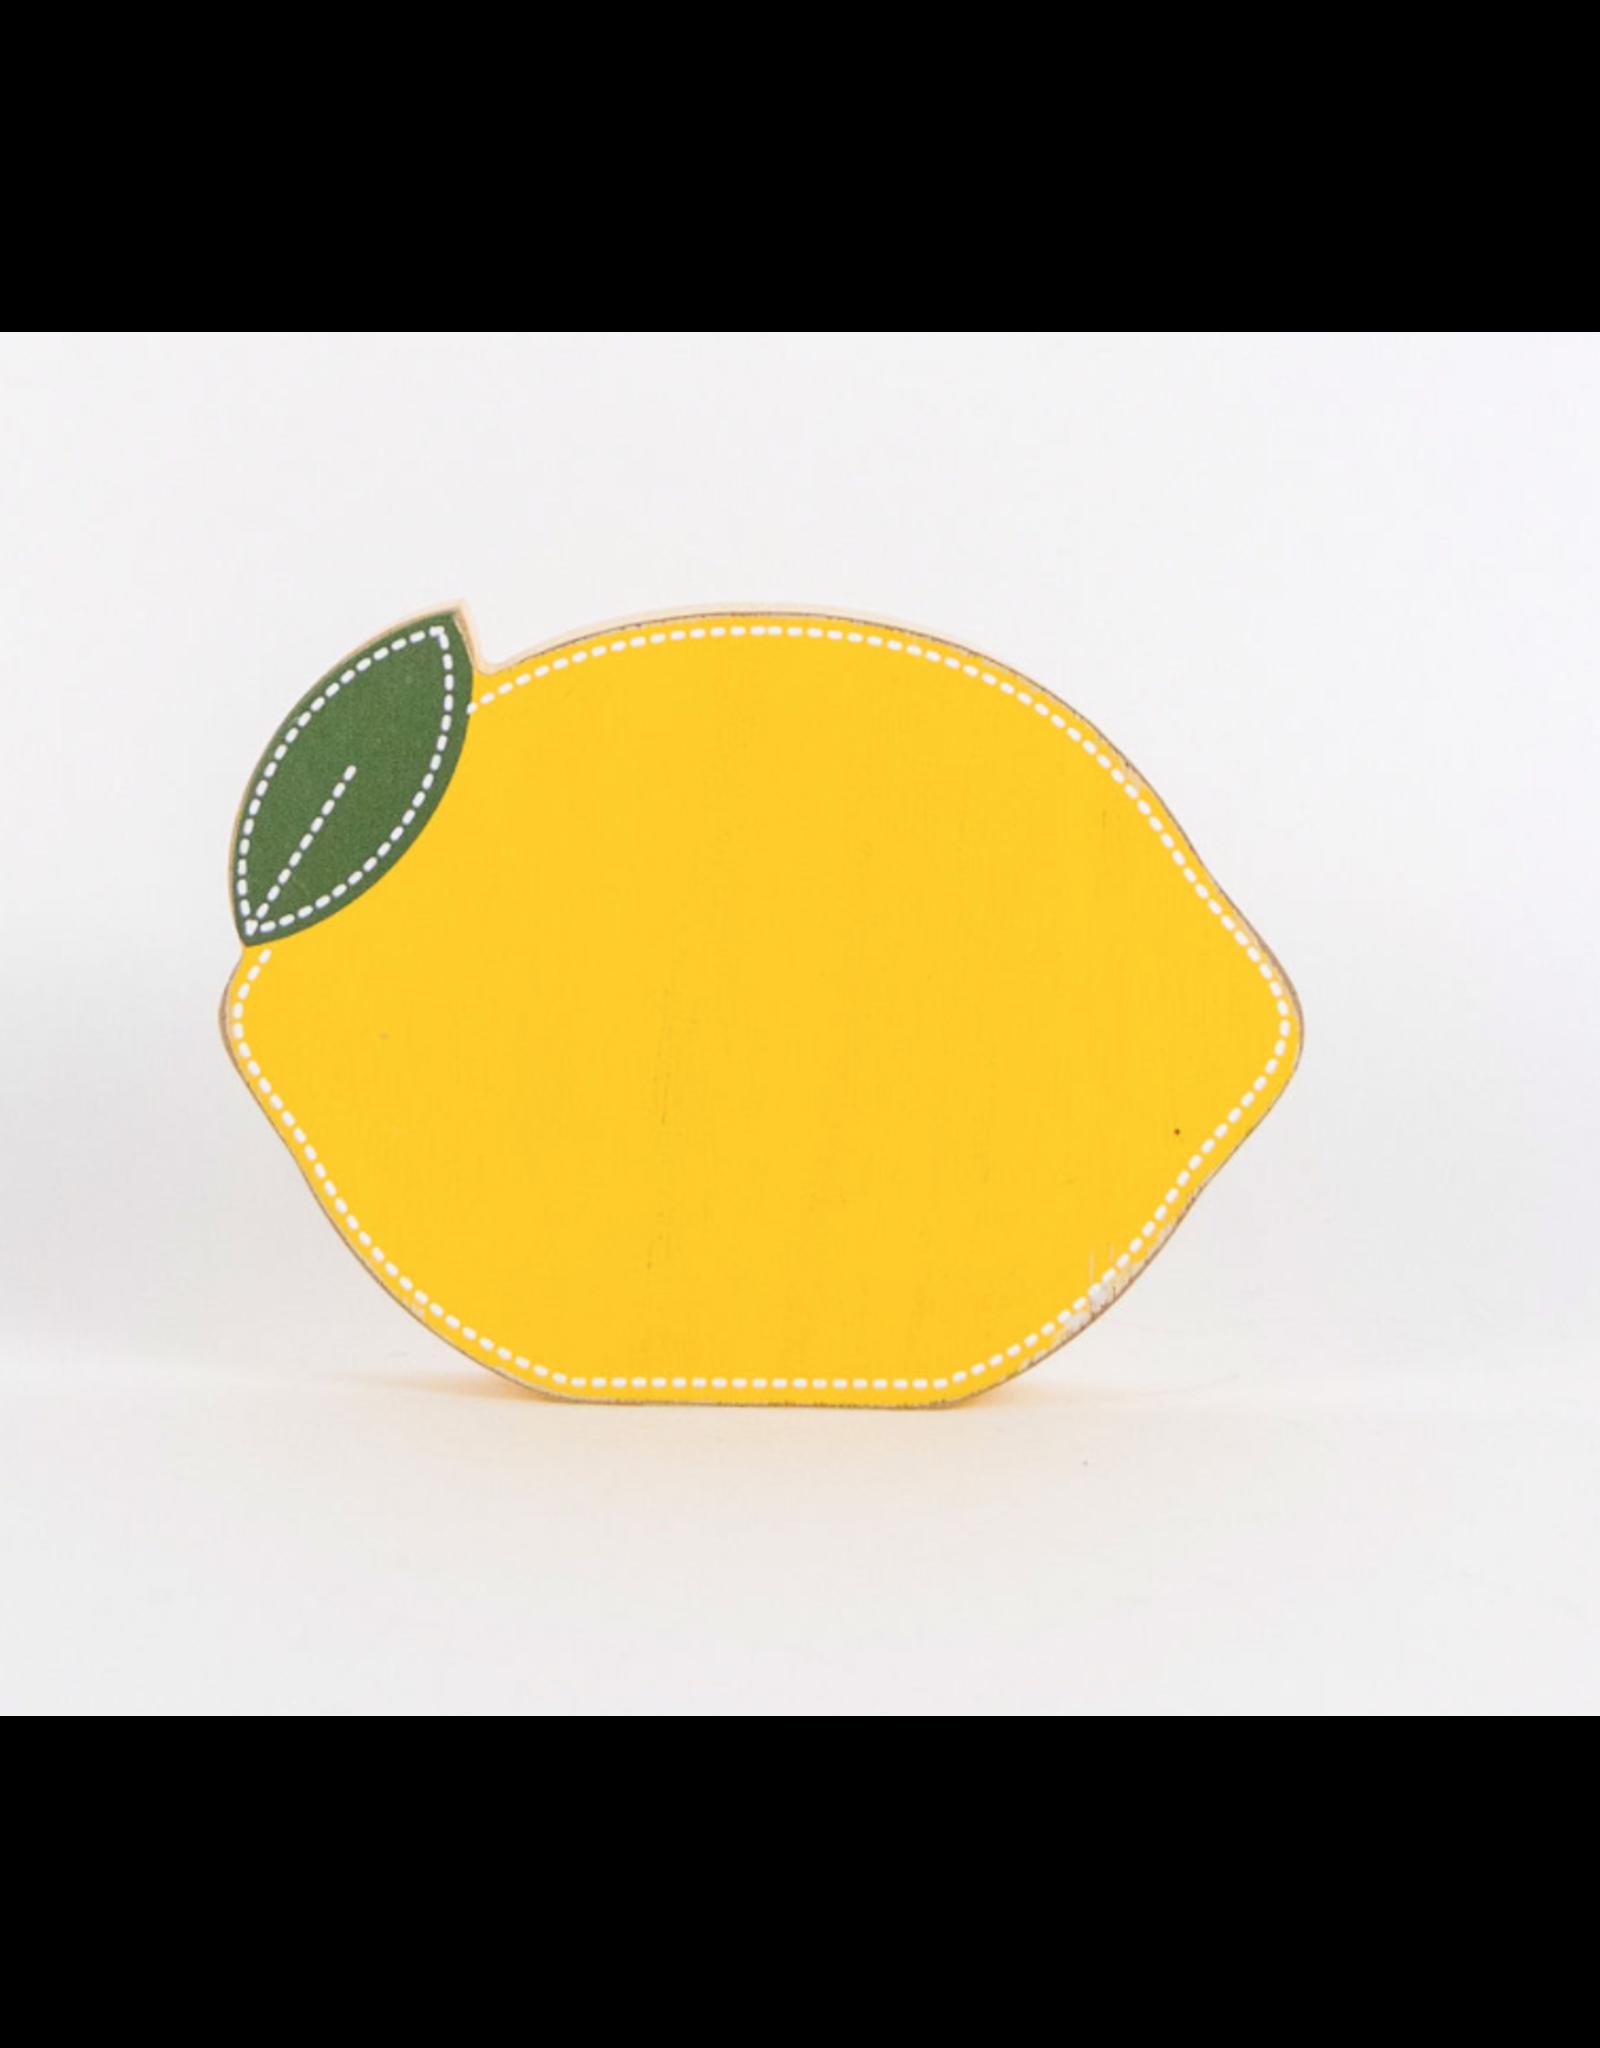 Adams & Co. Decorative Wooden Lemon